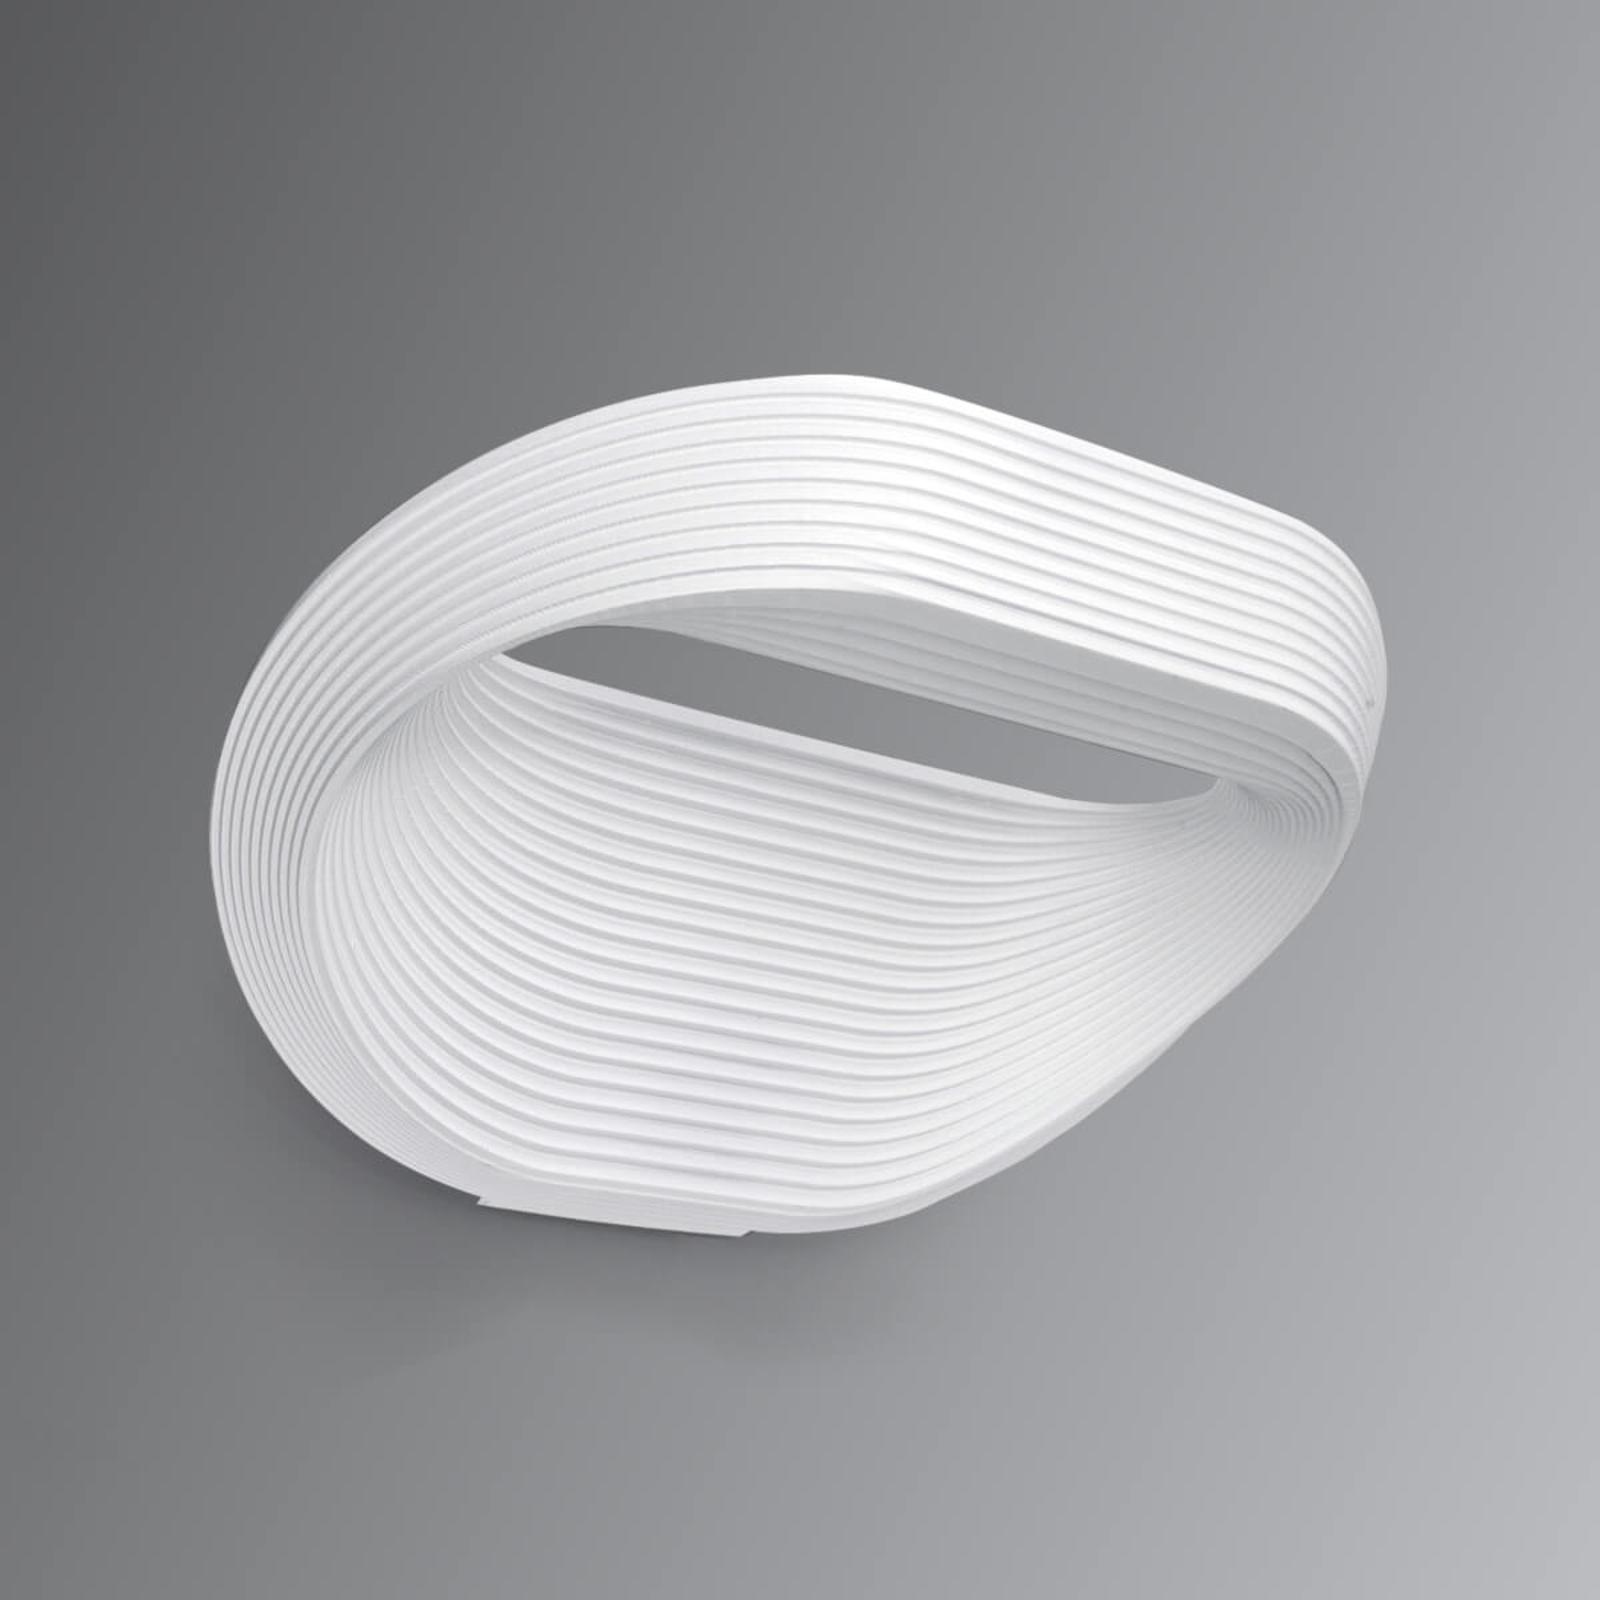 Cini&Nils Sestessa - weiße LED-Wandleuchte, 24 cm